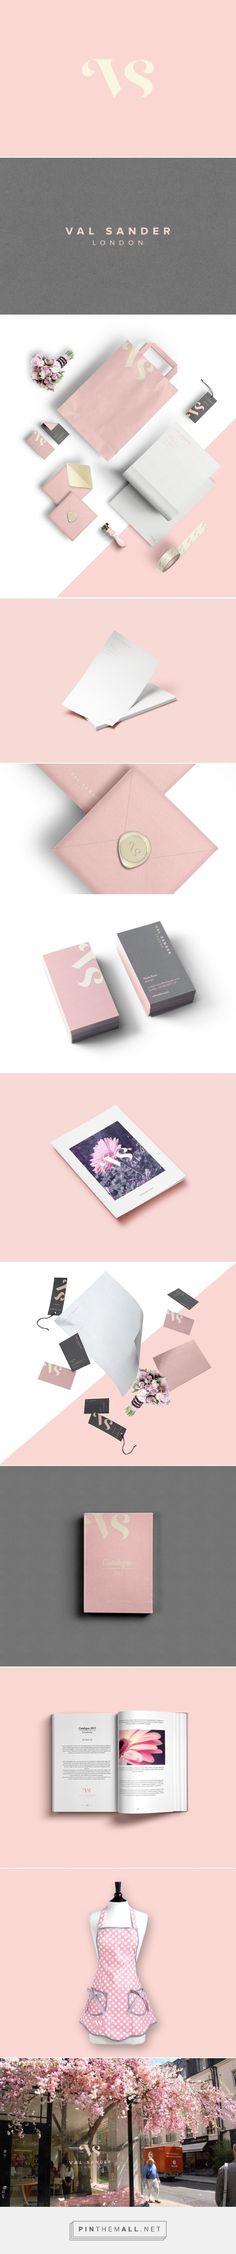 Val Sander's flower shop on Behance design and branding Graphisches Design, Logo Design, The Design Files, Brand Identity Design, Graphic Design Branding, Typography Design, Lettering, Brand Design, Modern Typography